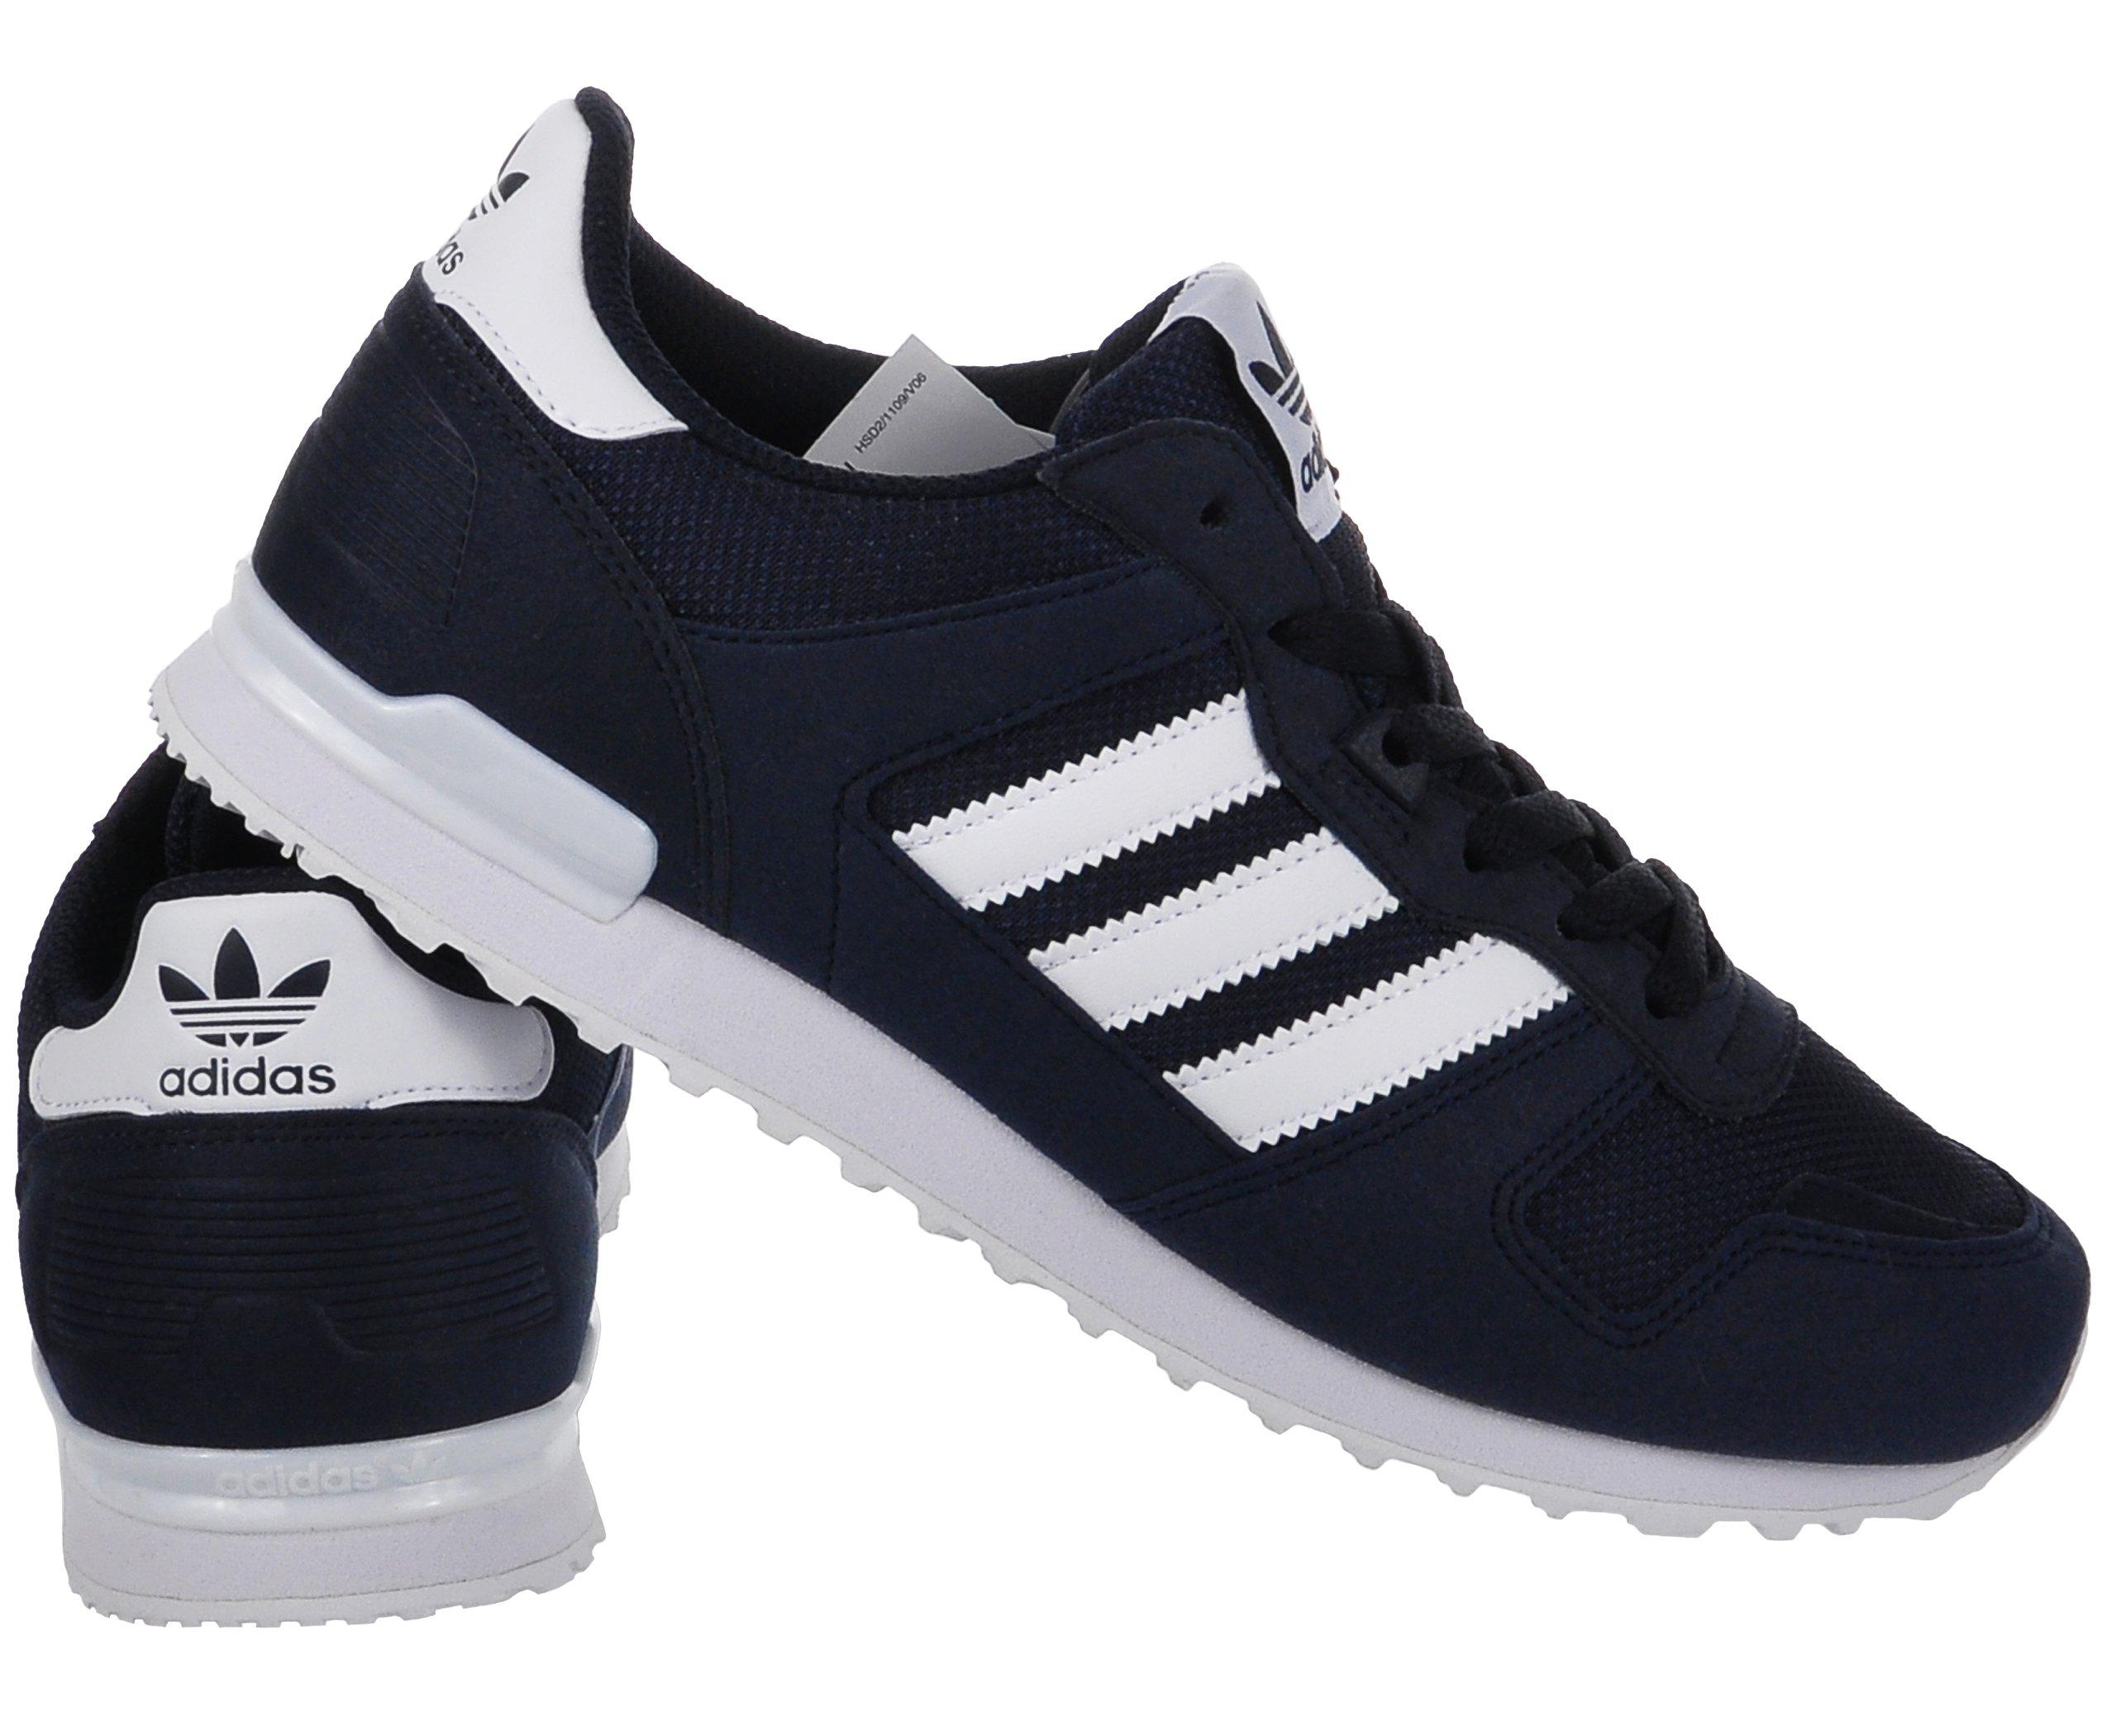 where to buy adidas zx 700 j b9032 7bf19